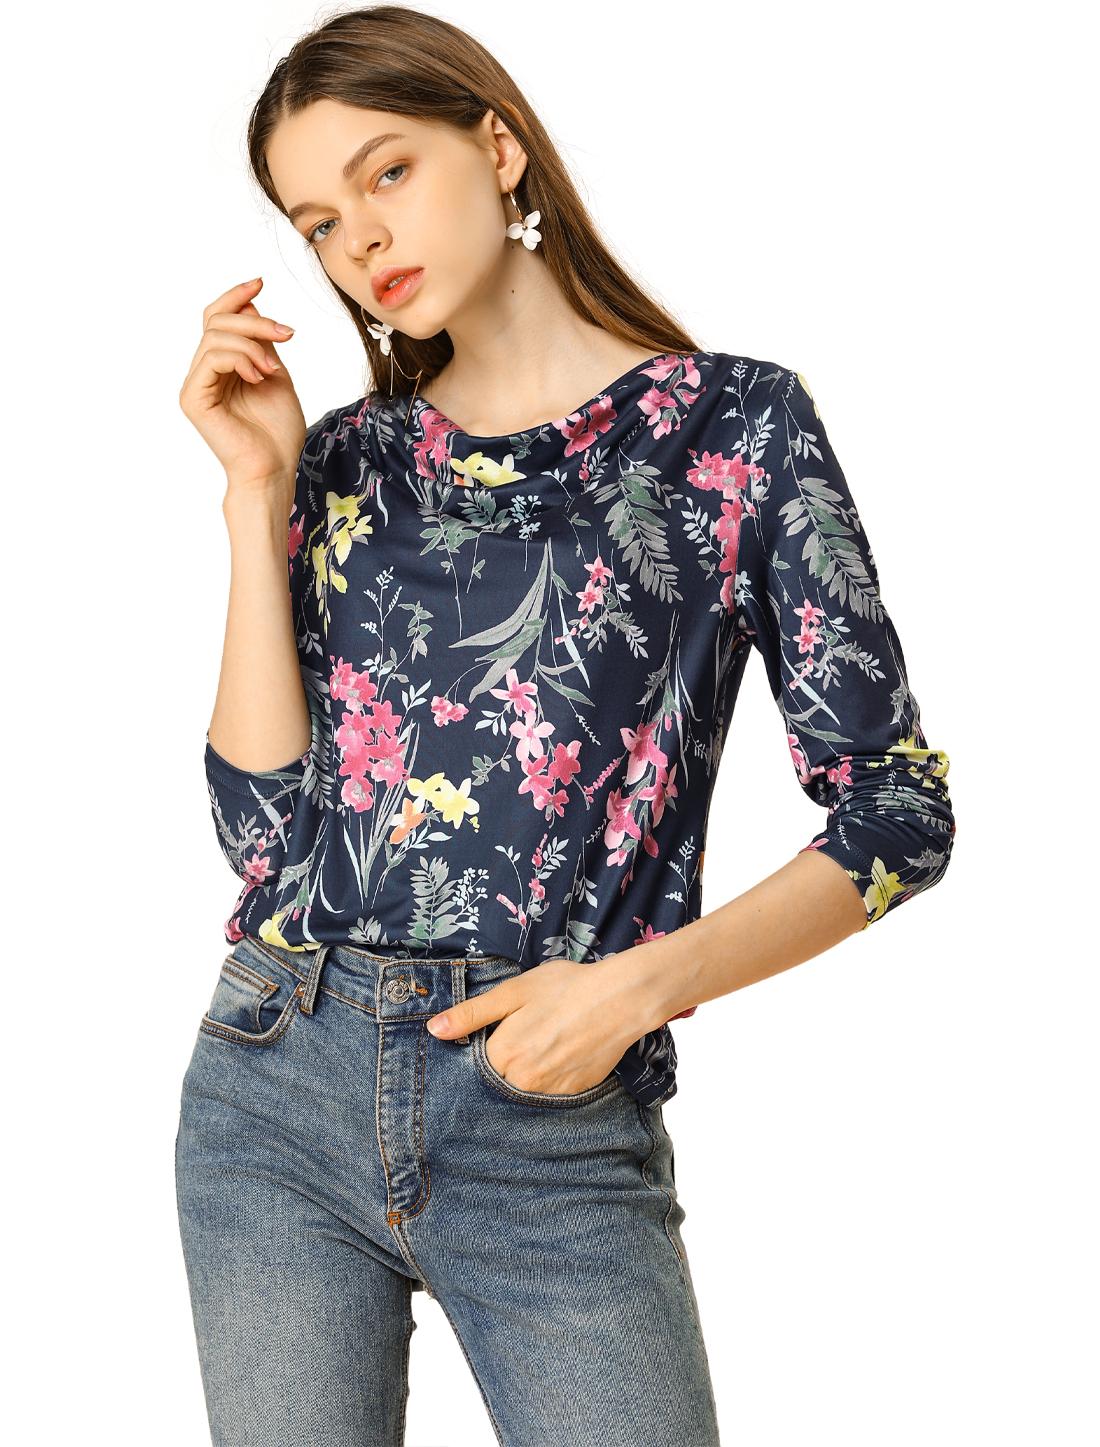 Allegra K Women's Floral Prints Cowl Neck Long Sleeves Top Deep Blue XS